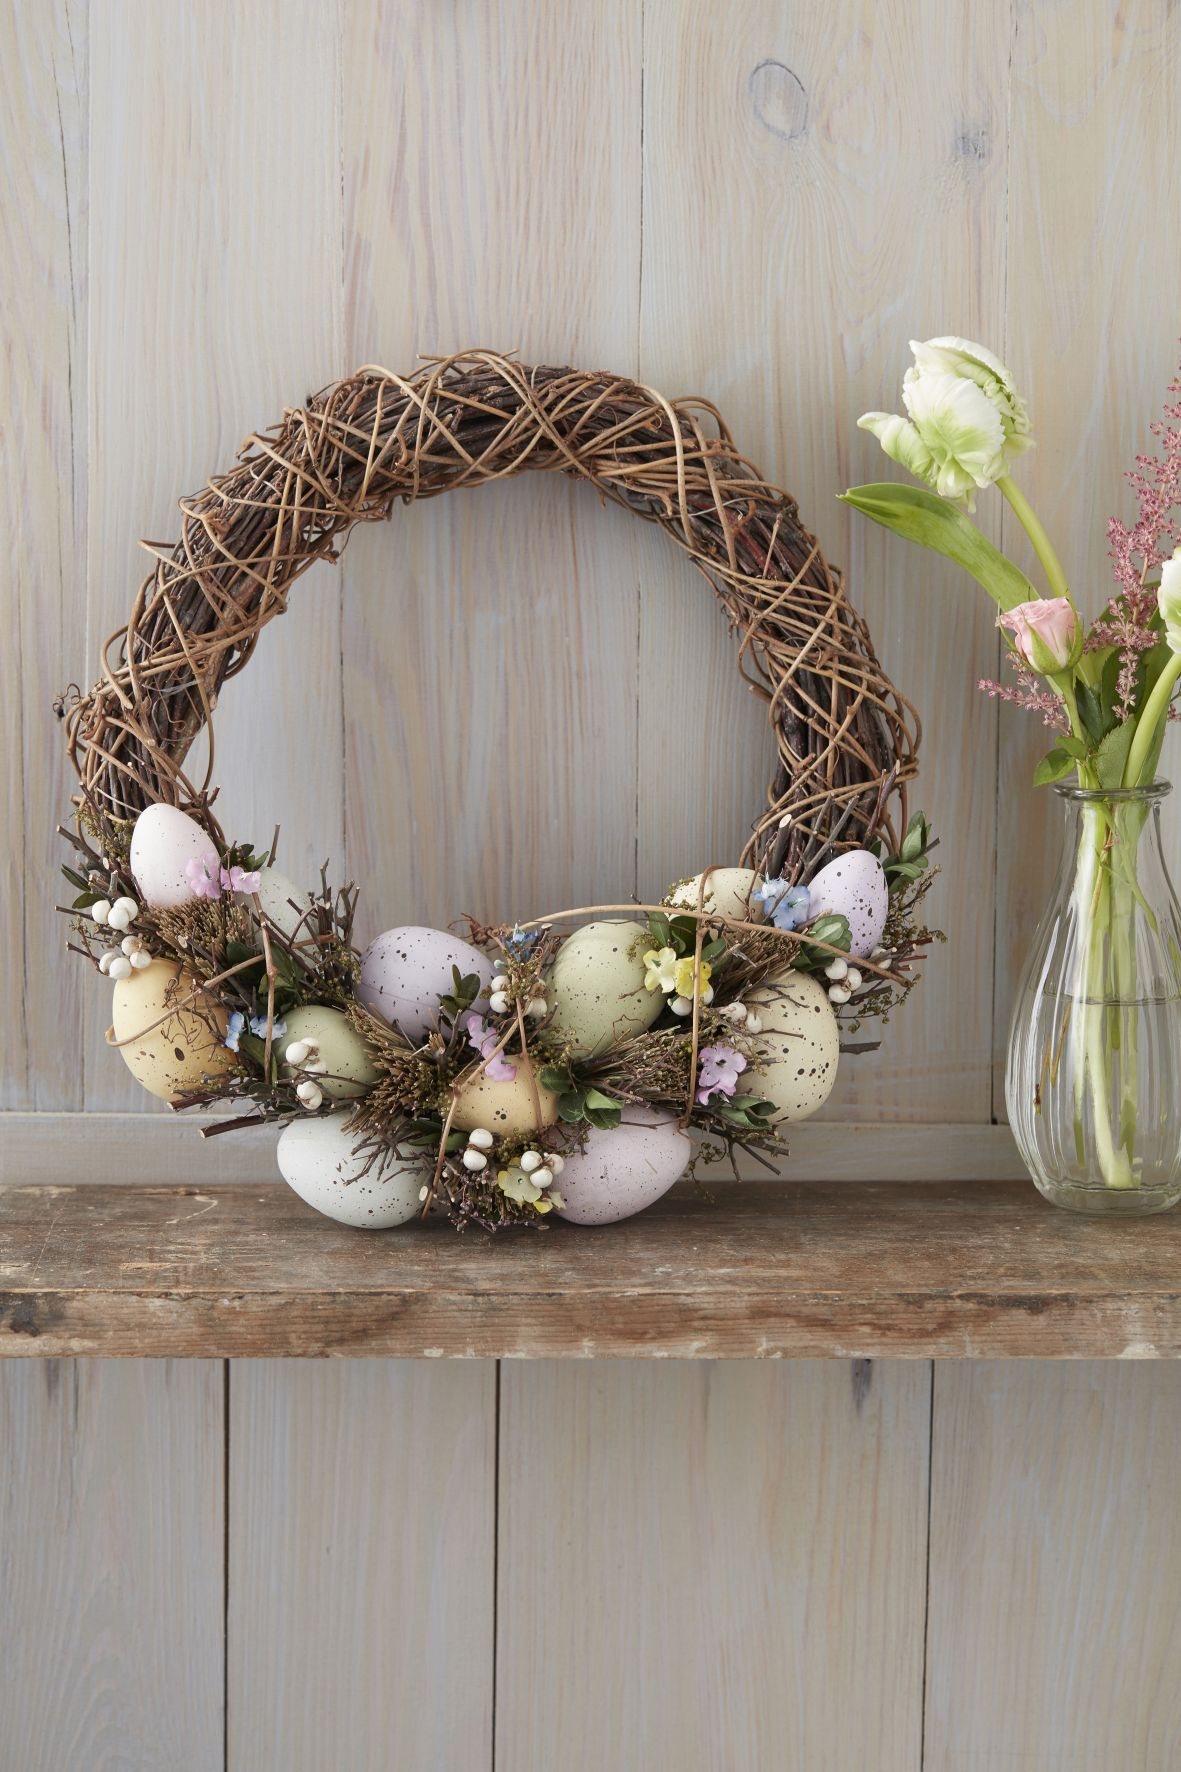 obr.5_the-contemporary-home_twig-wreath-with-birds-nest-swag-al21.00.jpg